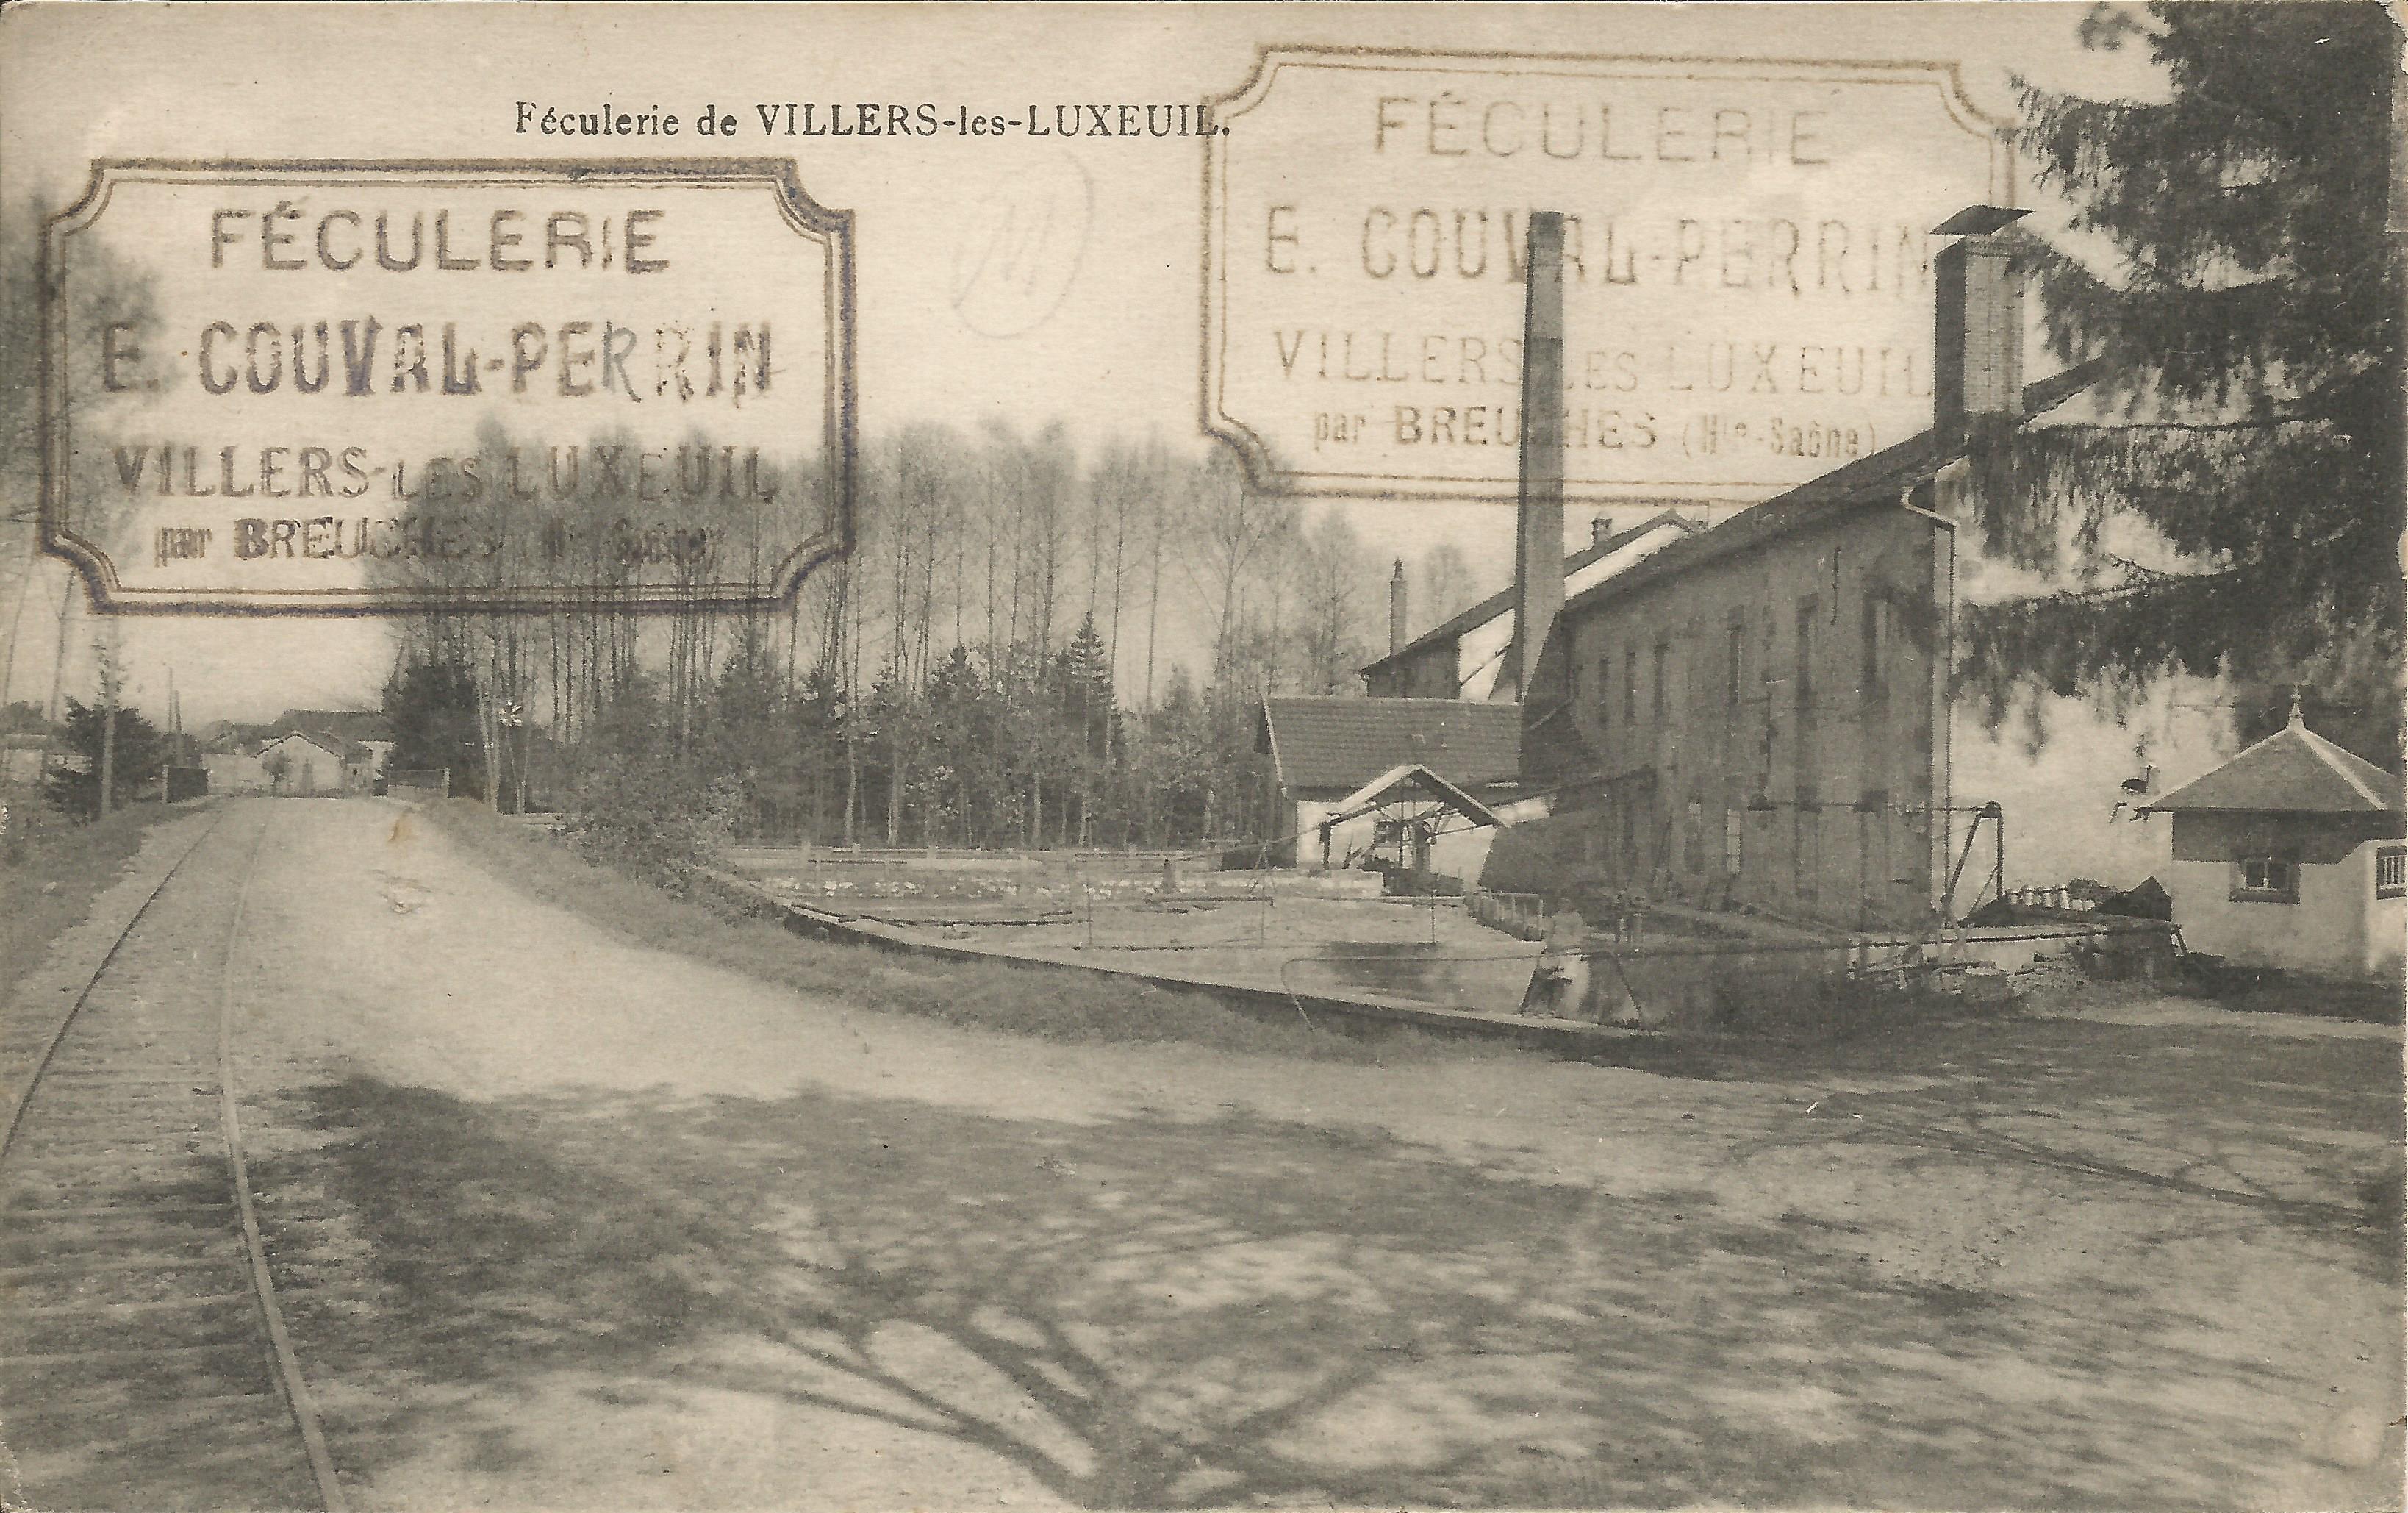 https://www.villers-les-luxeuil.com/projets/villers/files/images/Cartes_postales/Feculerie_2015/Feculerie_2_1929.jpg